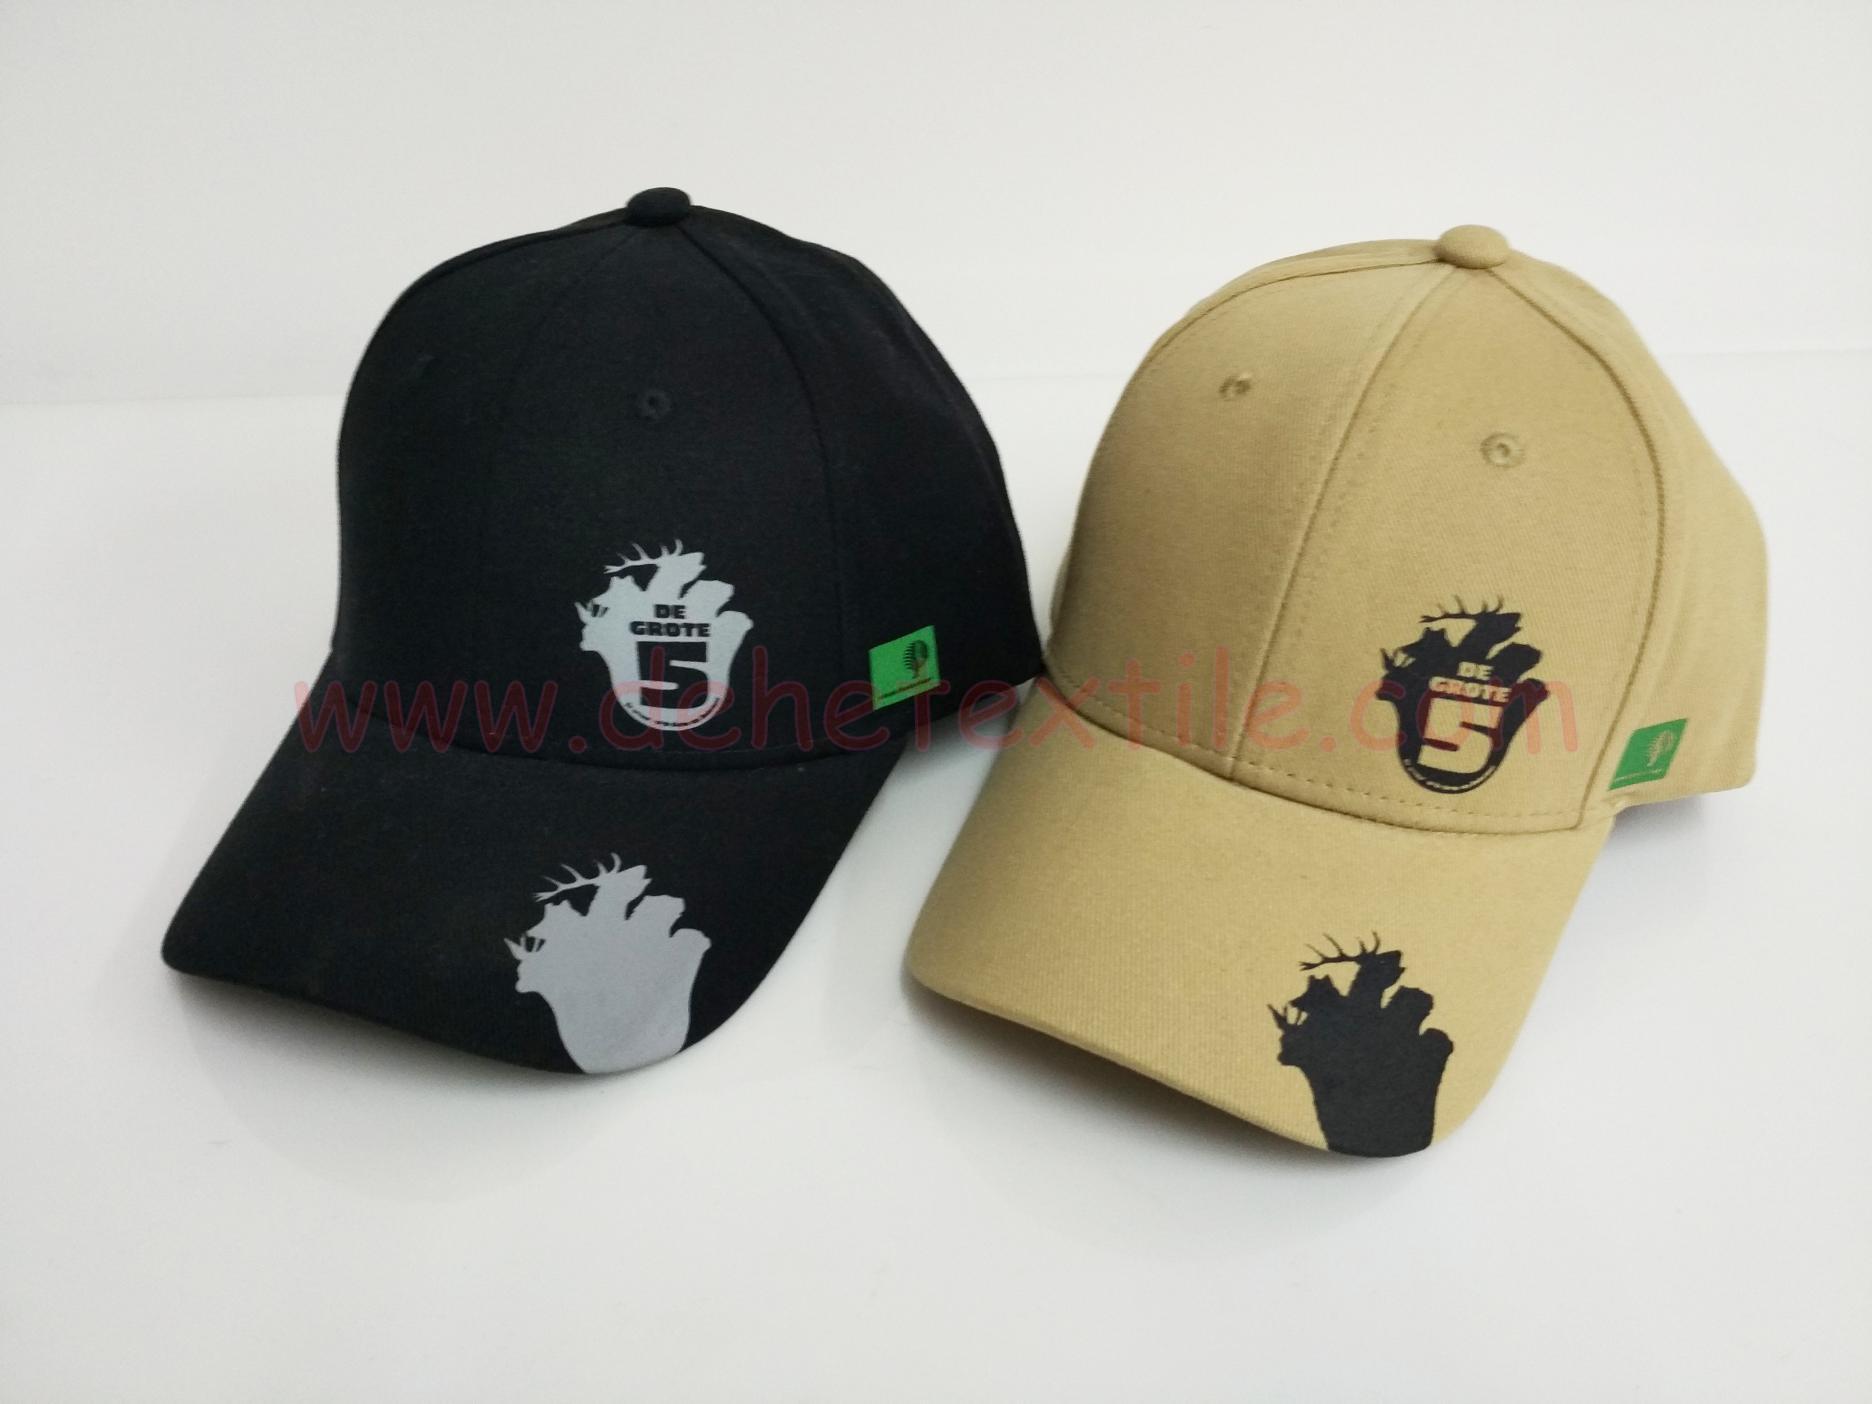 339a8689a695d8 ... Outdoor top Cotton wholesale Baseball Car fancy stylish hats topman Caps  ...